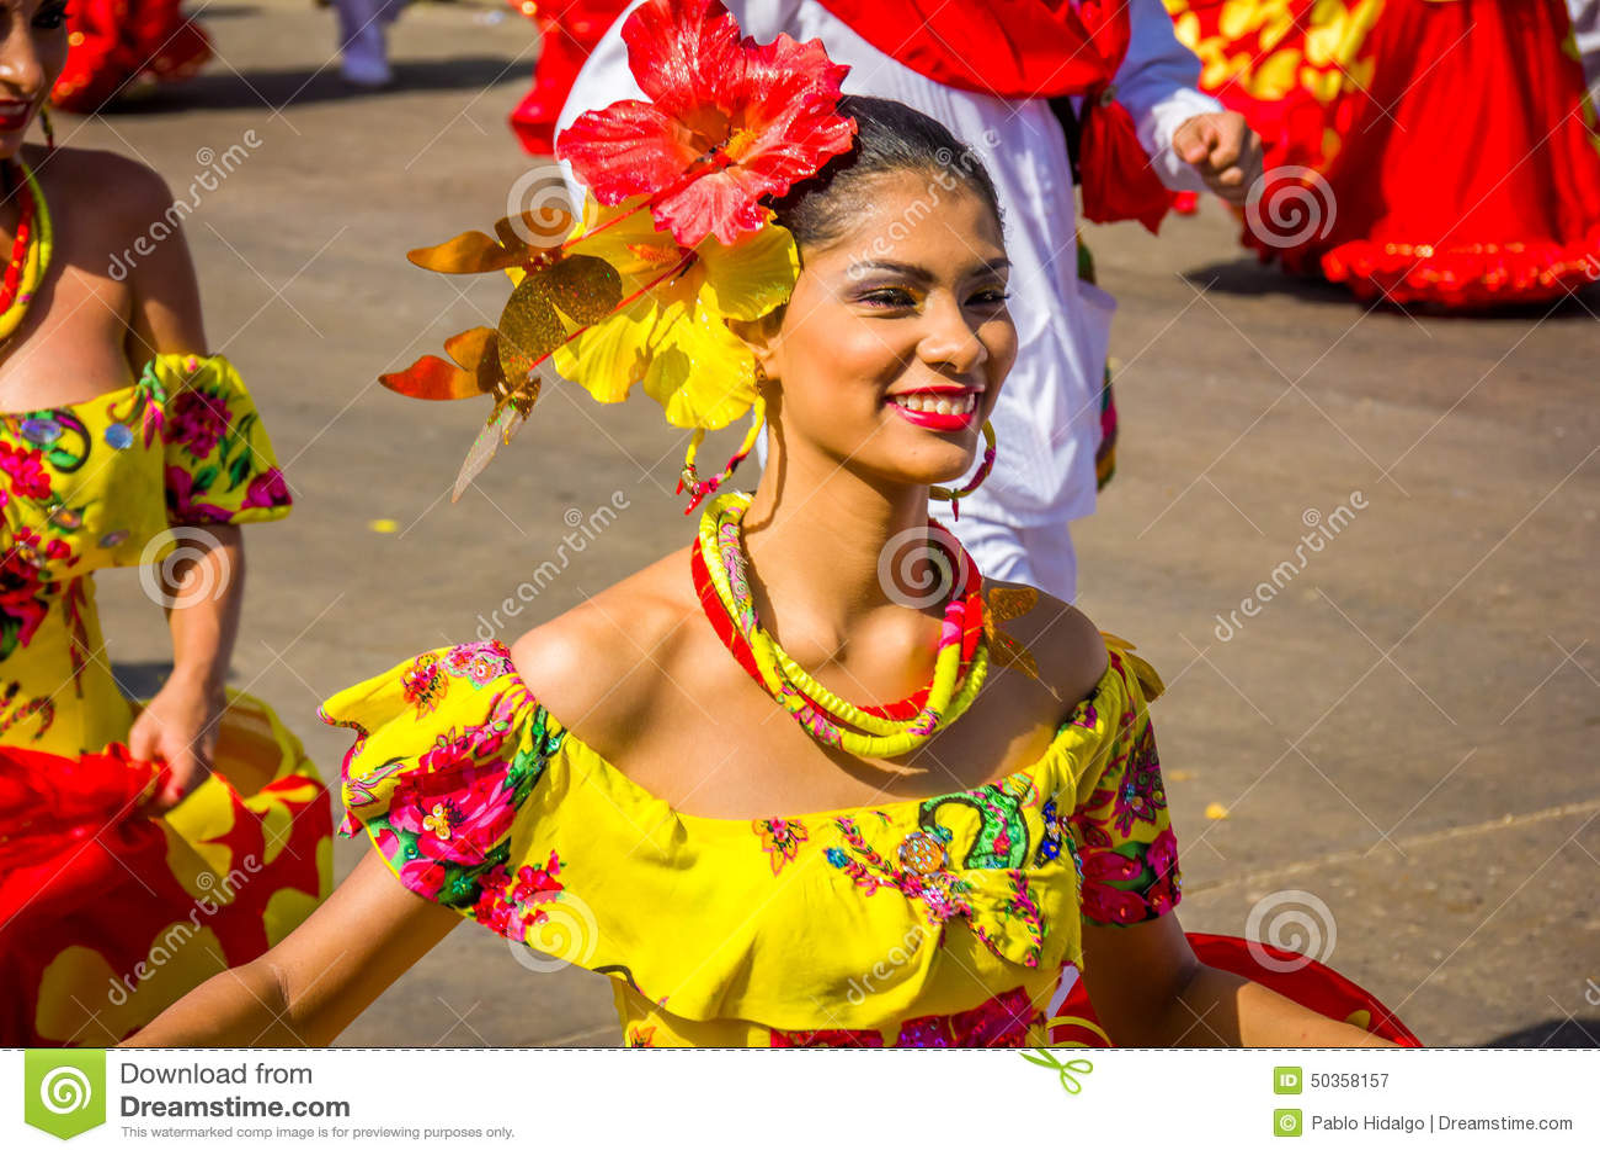 Uitvoerders met kleurrijke en gedetailleerde kostuums